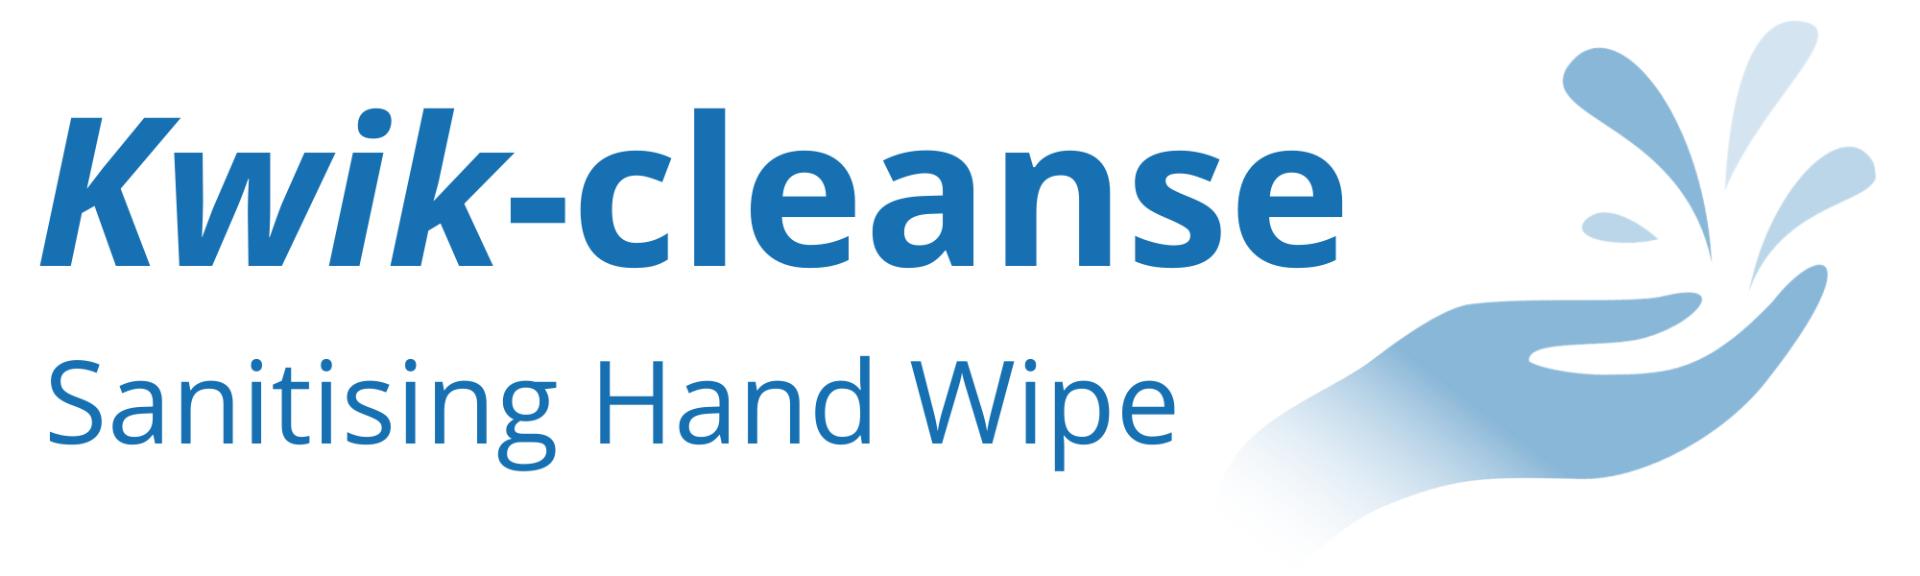 kwik-cleanse logo